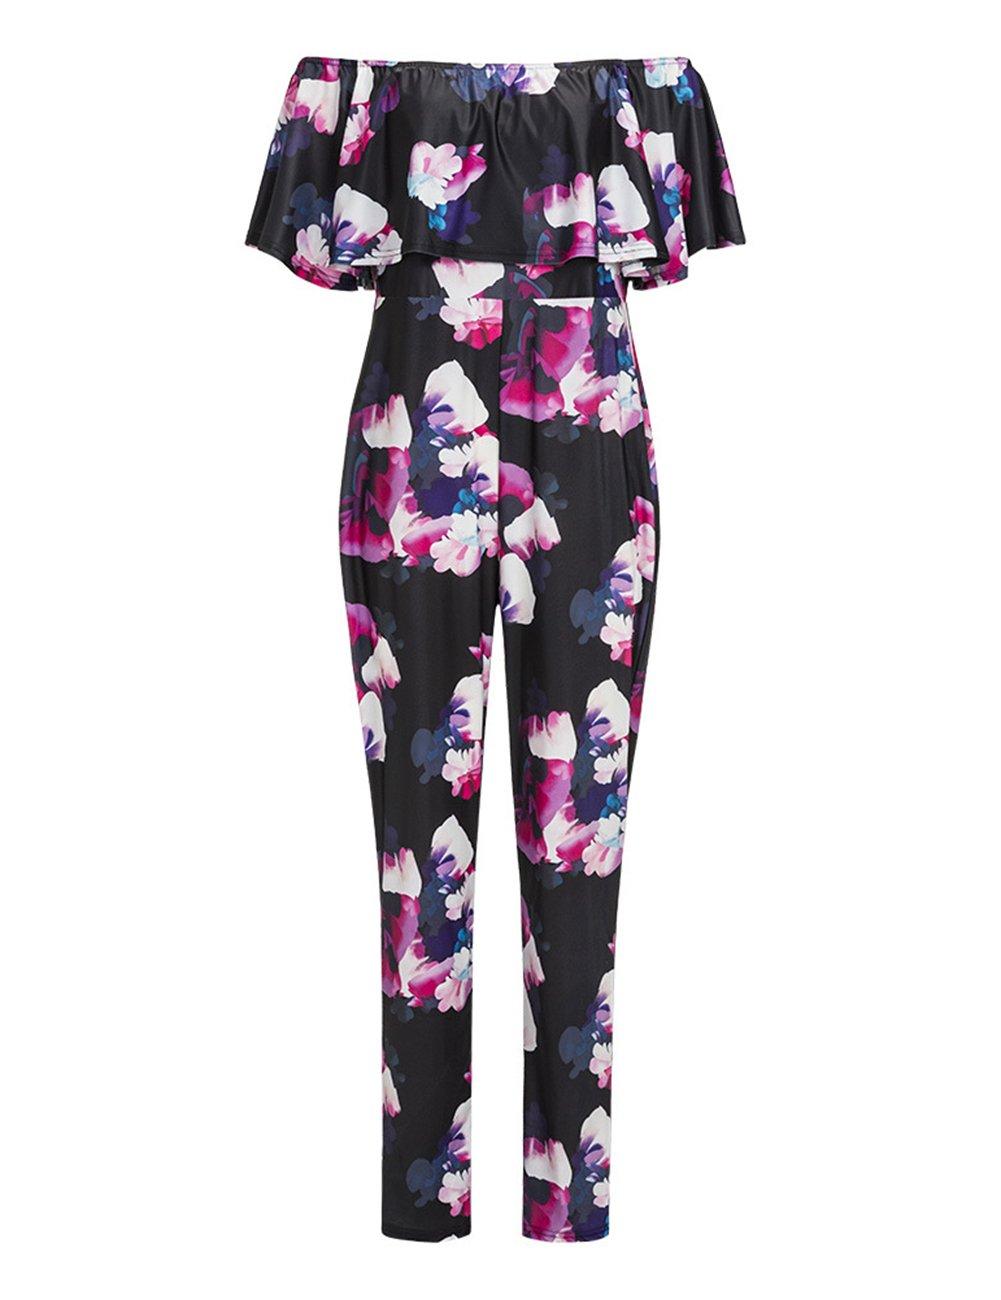 Yiwa Women's Fashion Off Shoulder Short Sleeve Printing Sexy Jumpsuit Large Size